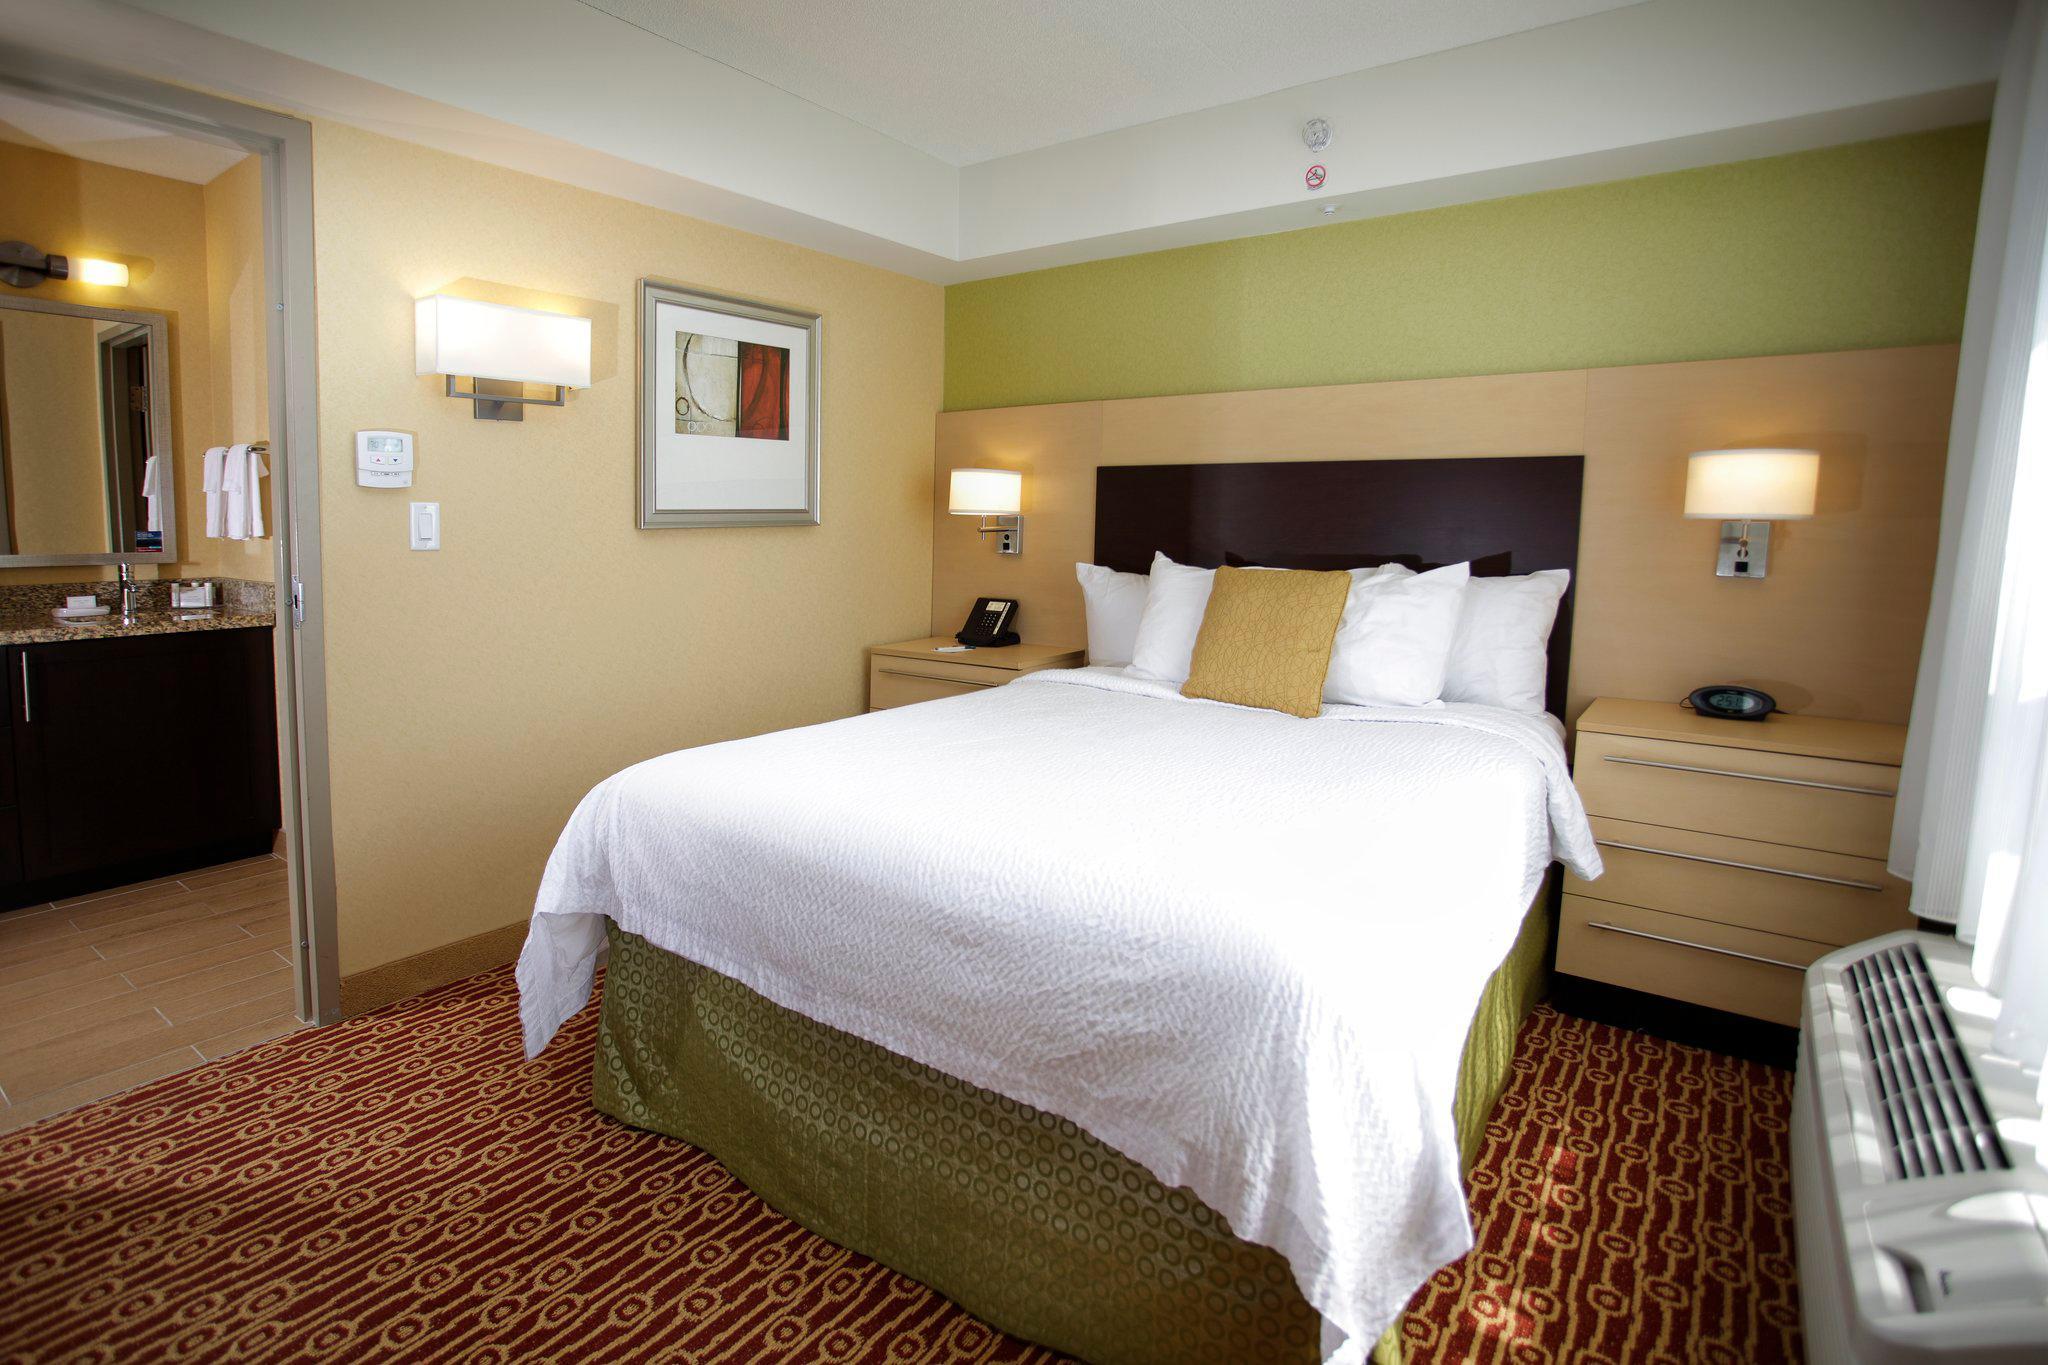 TownePlace Suites by Marriott Sudbury in Sudbury